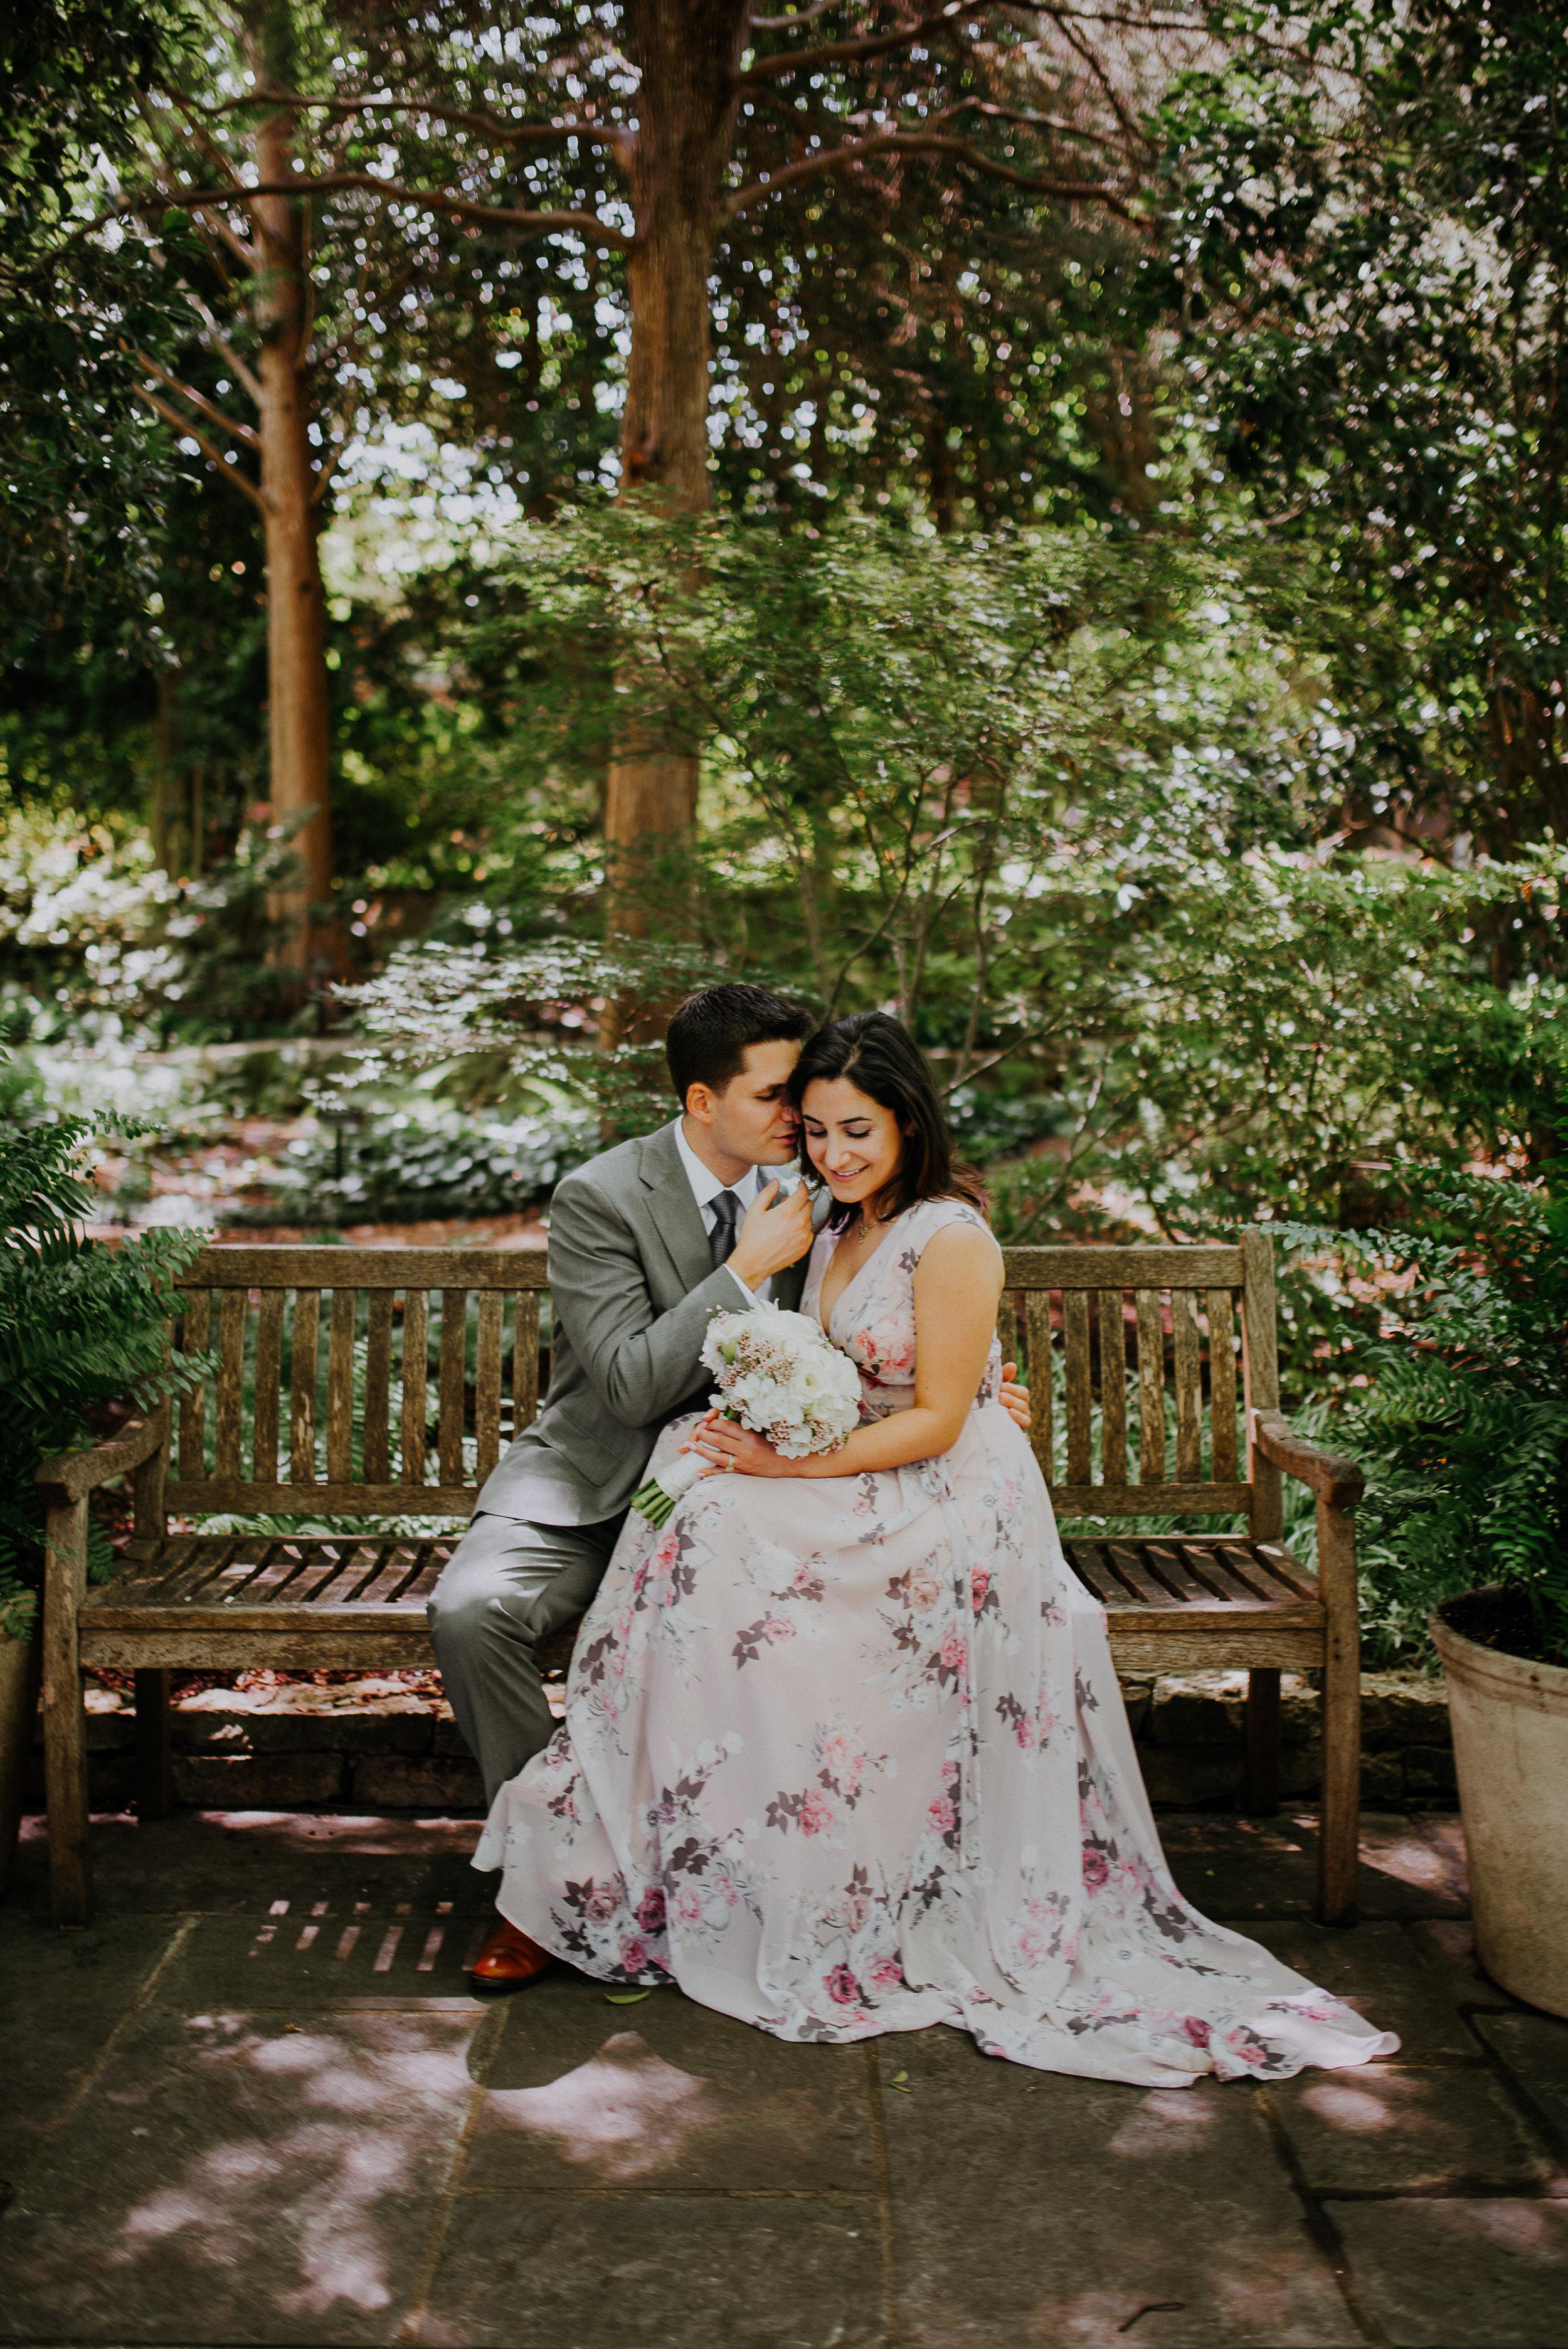 Dallas-fort-worth-wedding-photographer-dallas-arboretum-intimate-wedding-dallas-texas-29